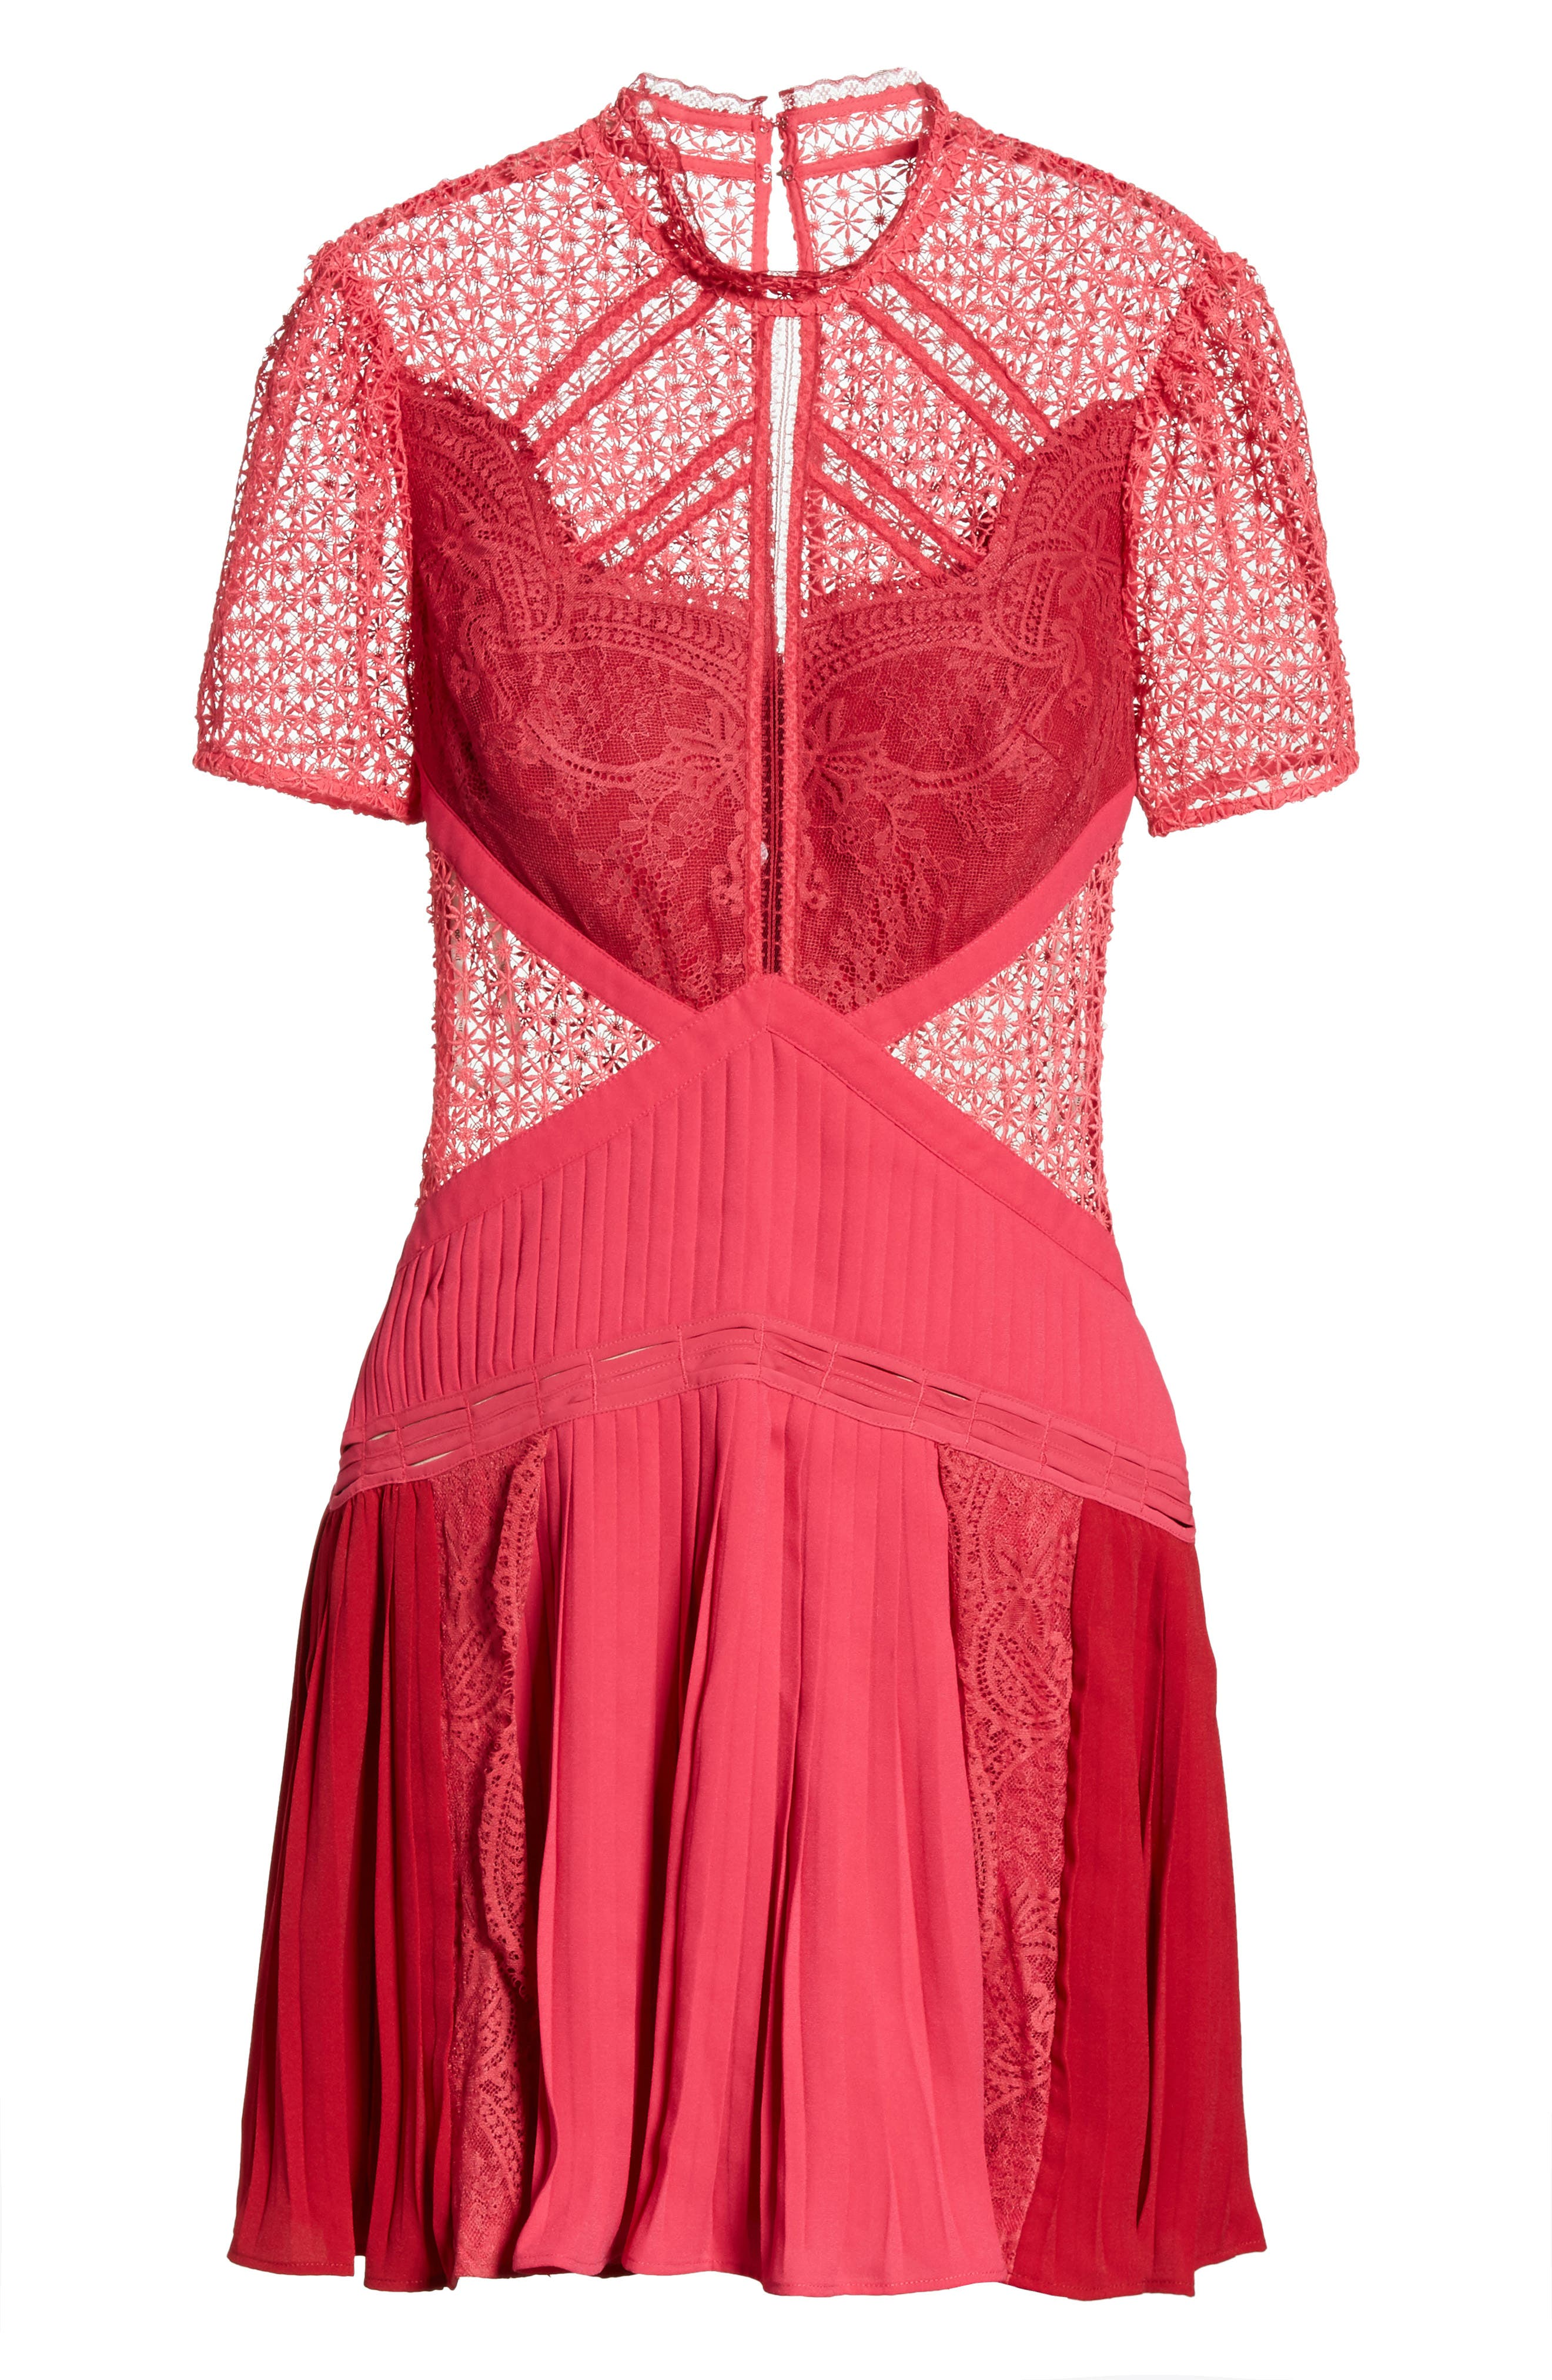 Paneled Lace Dress,                             Alternate thumbnail 7, color,                             653